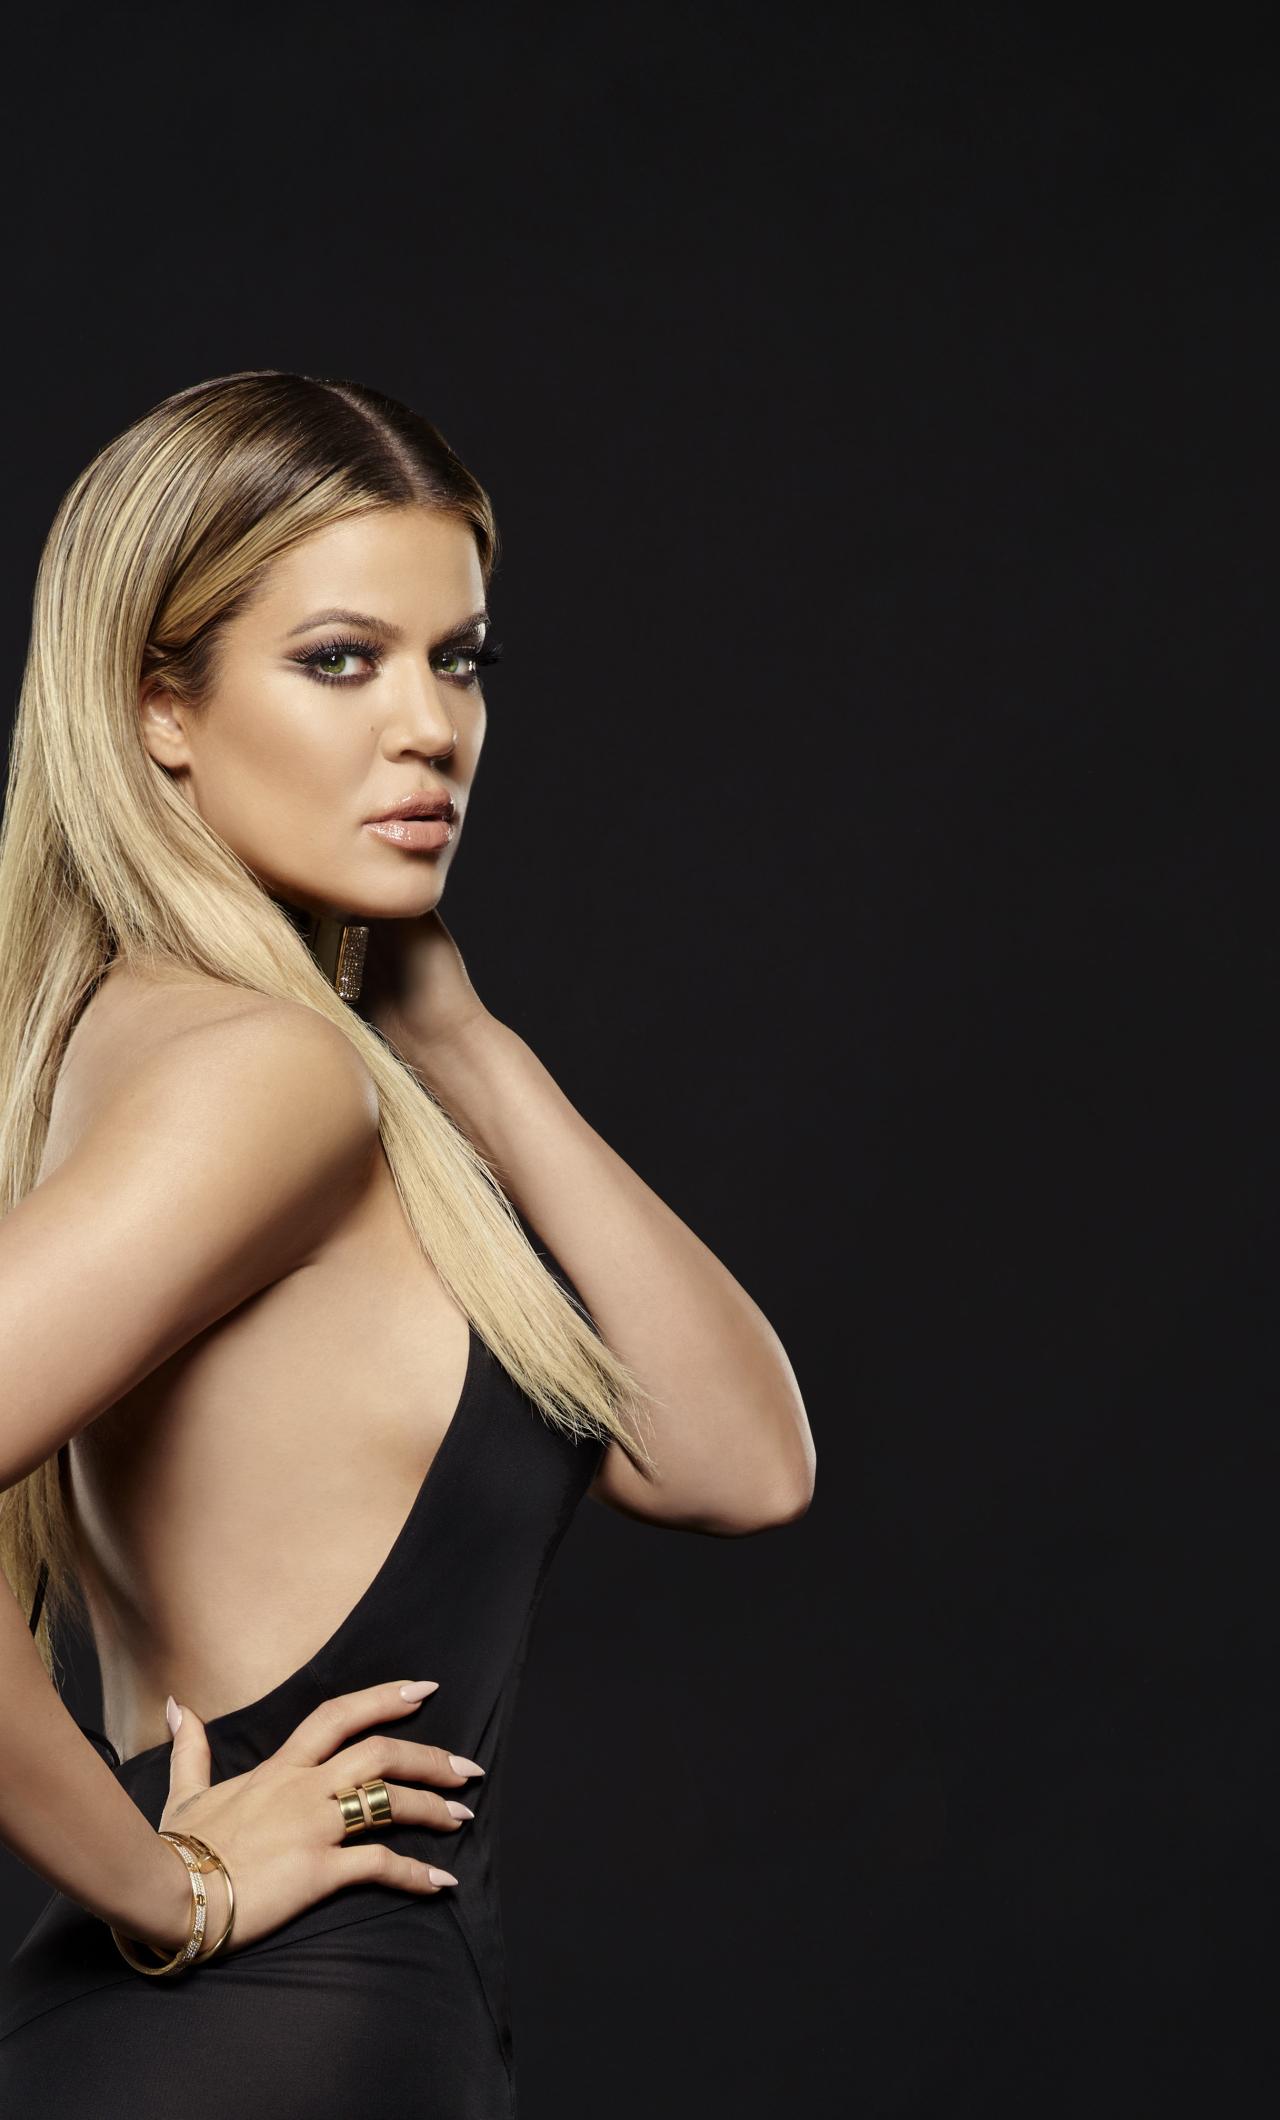 Khloe Kardashian Keeping Up With The Kardashians Season 14 HD 8K